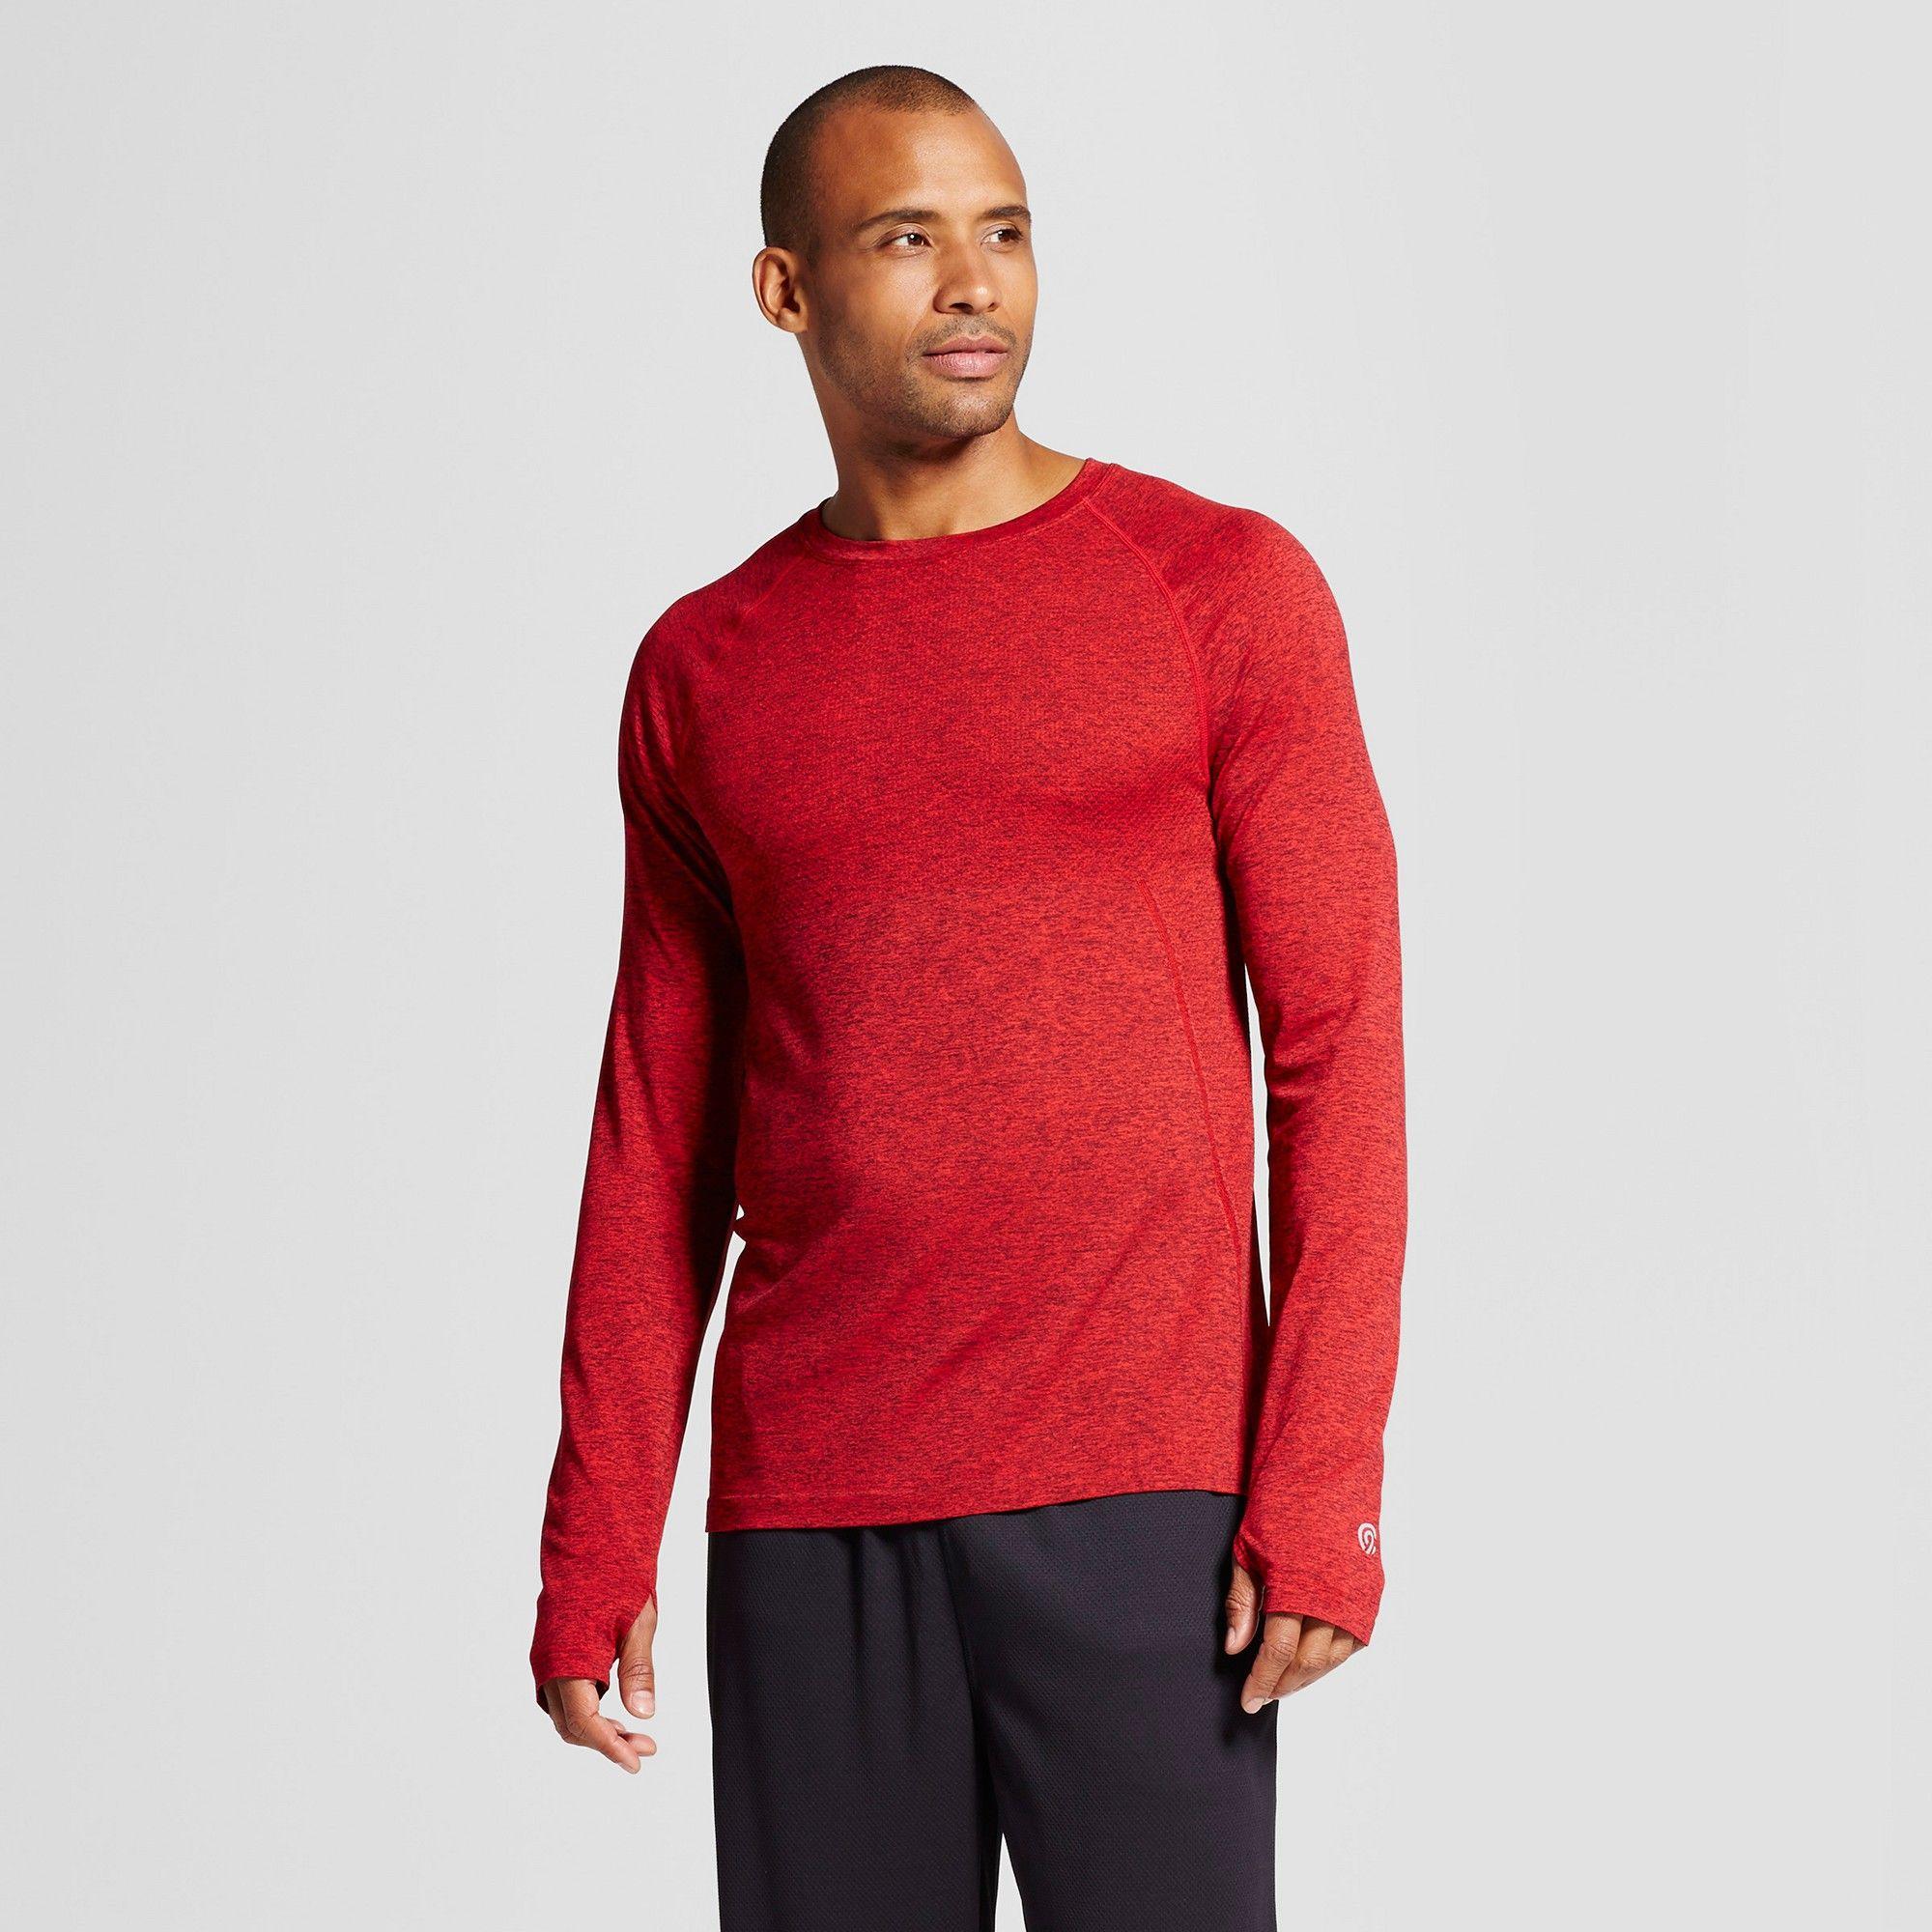 a922efdd9 Men's Longsleeve Seamless T-shirt - C9 Champion Ripe Red Heather M ...